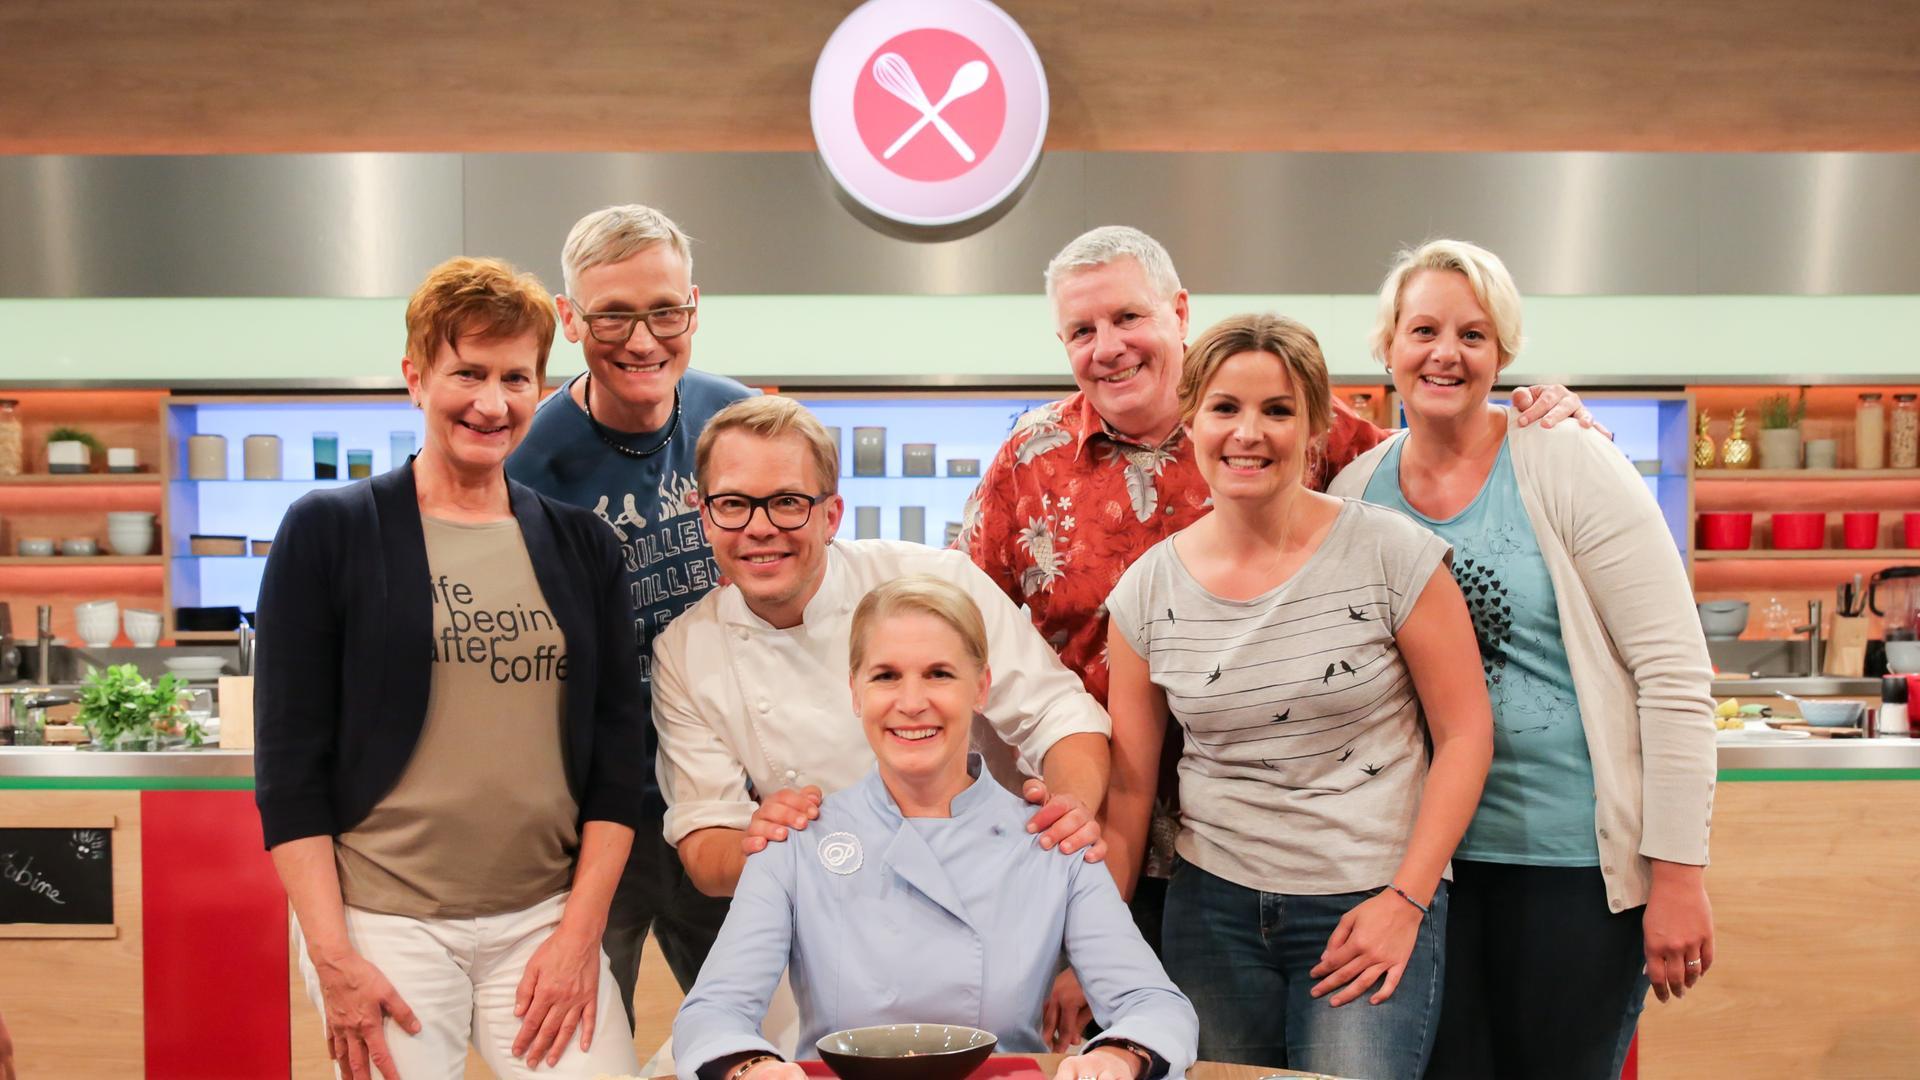 Die Kuchenschlacht Vom 11 September 2018 Zdfmediathek